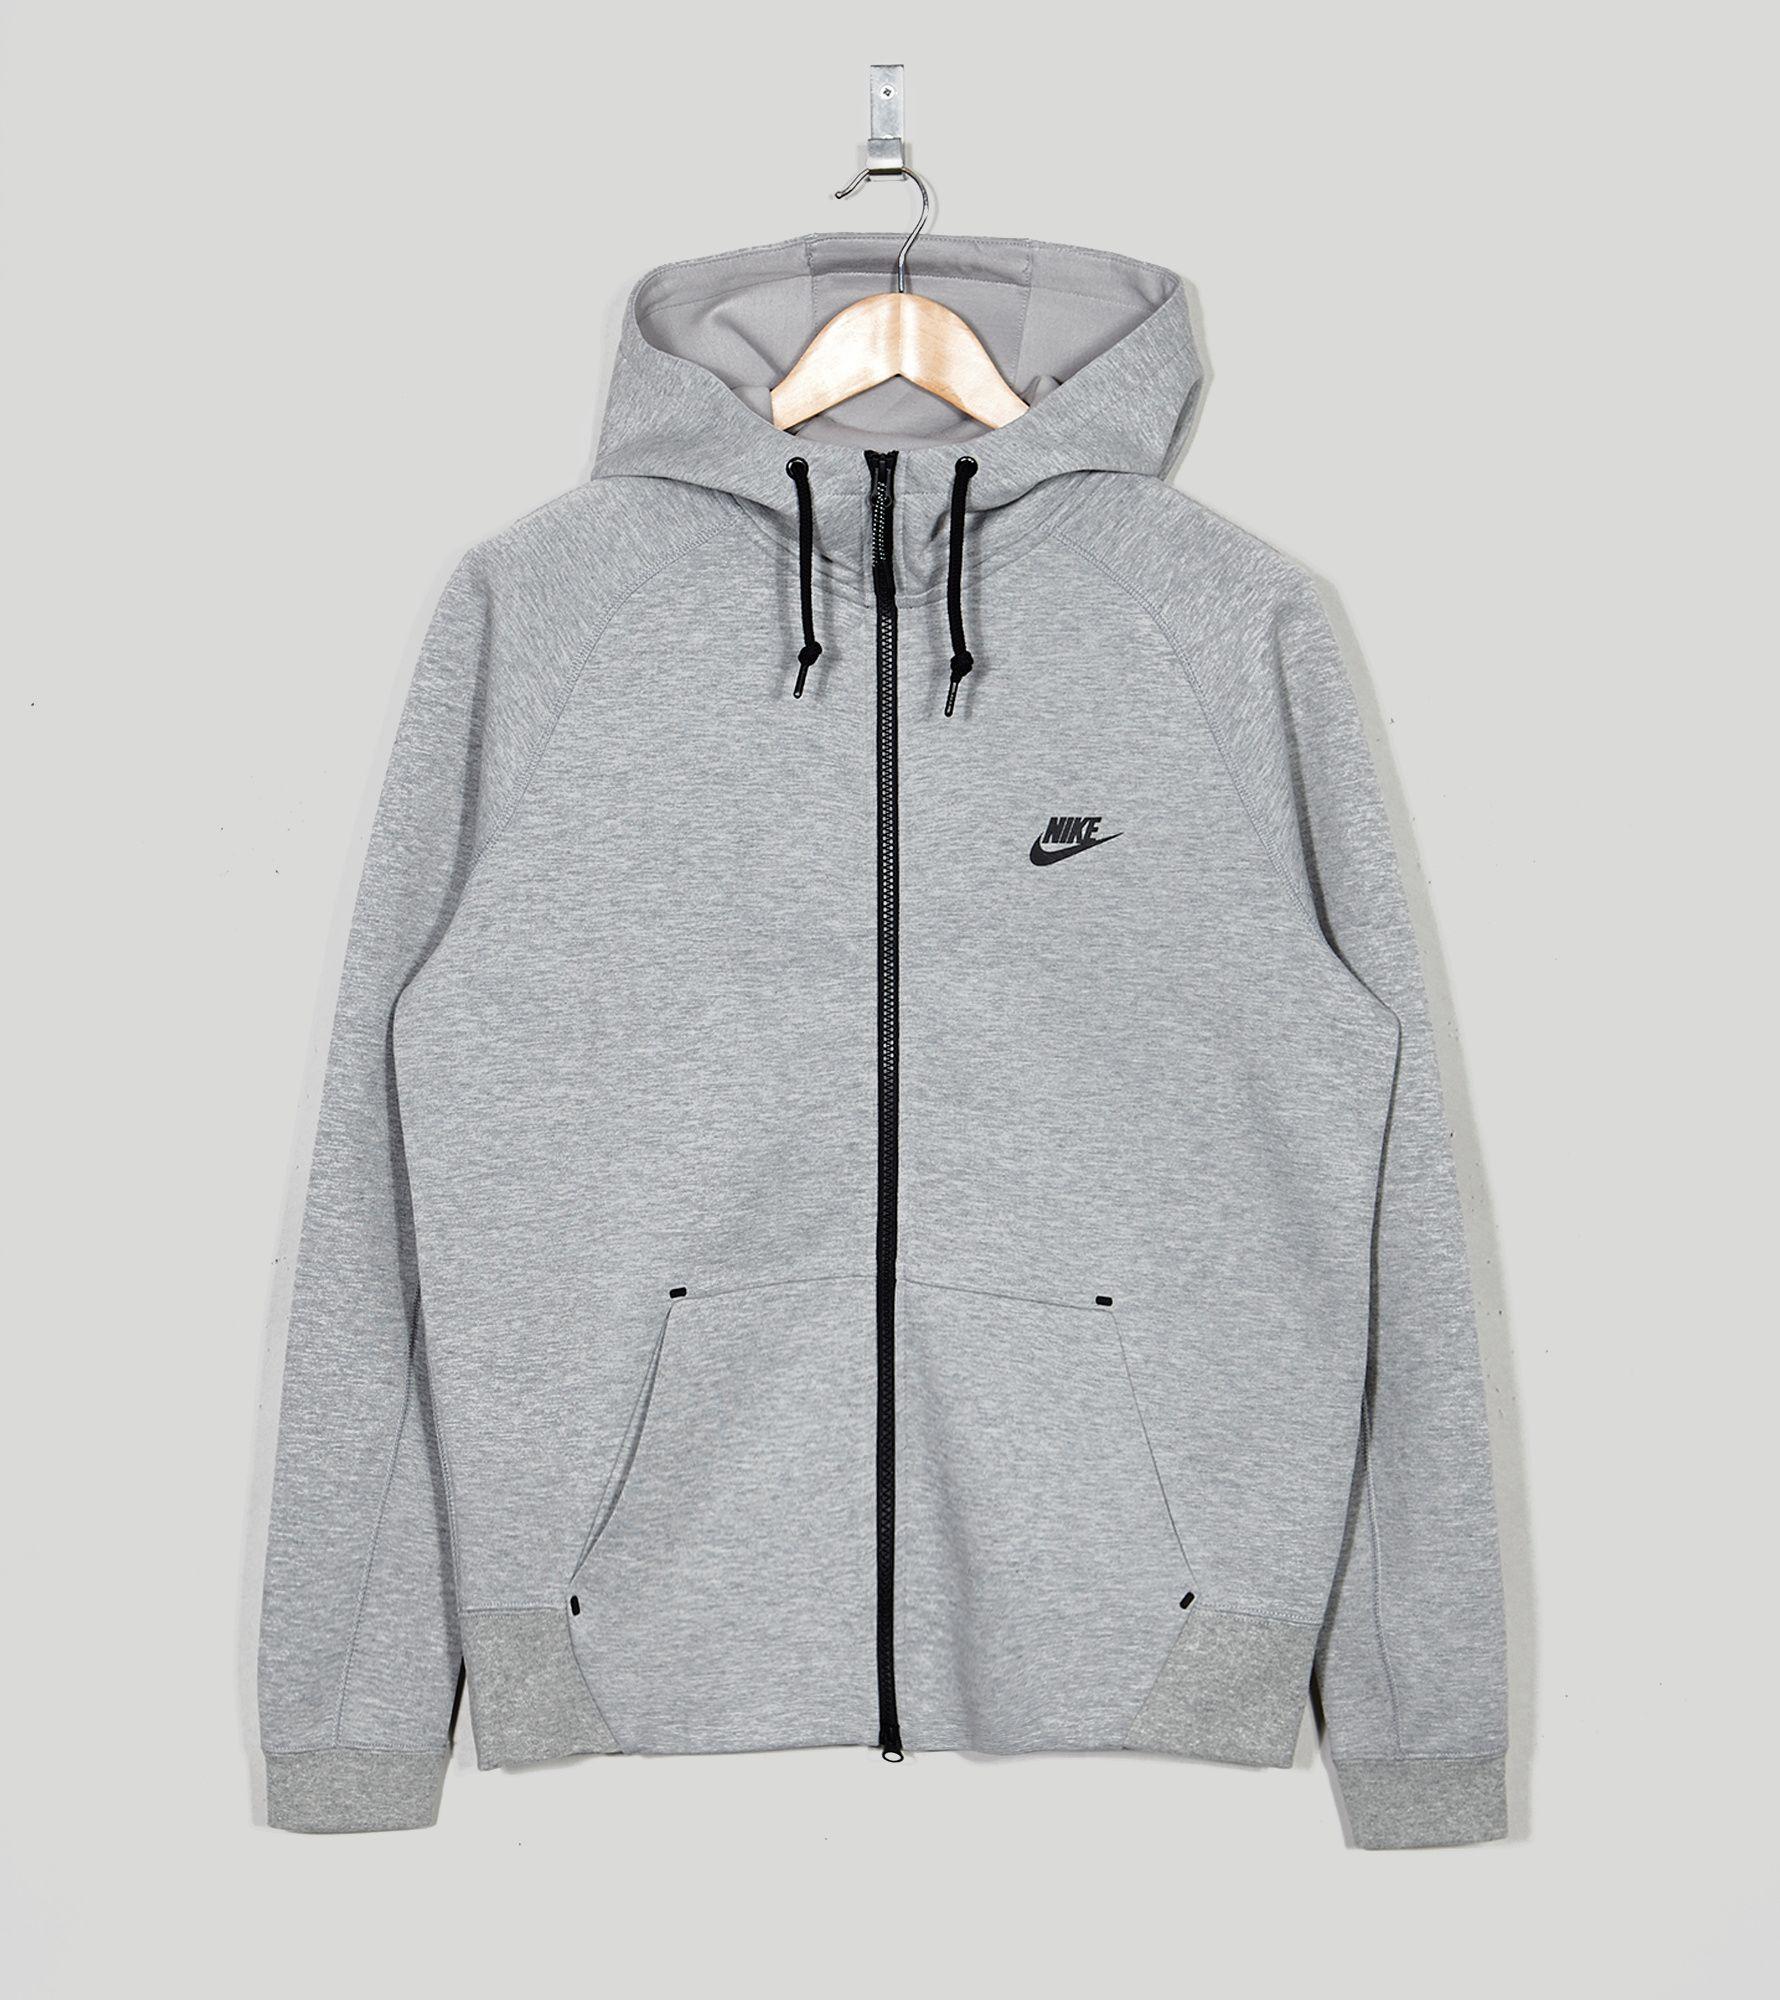 Nike Tech Fleece AW77 Full Zip Hoody  1cc04e559eaf